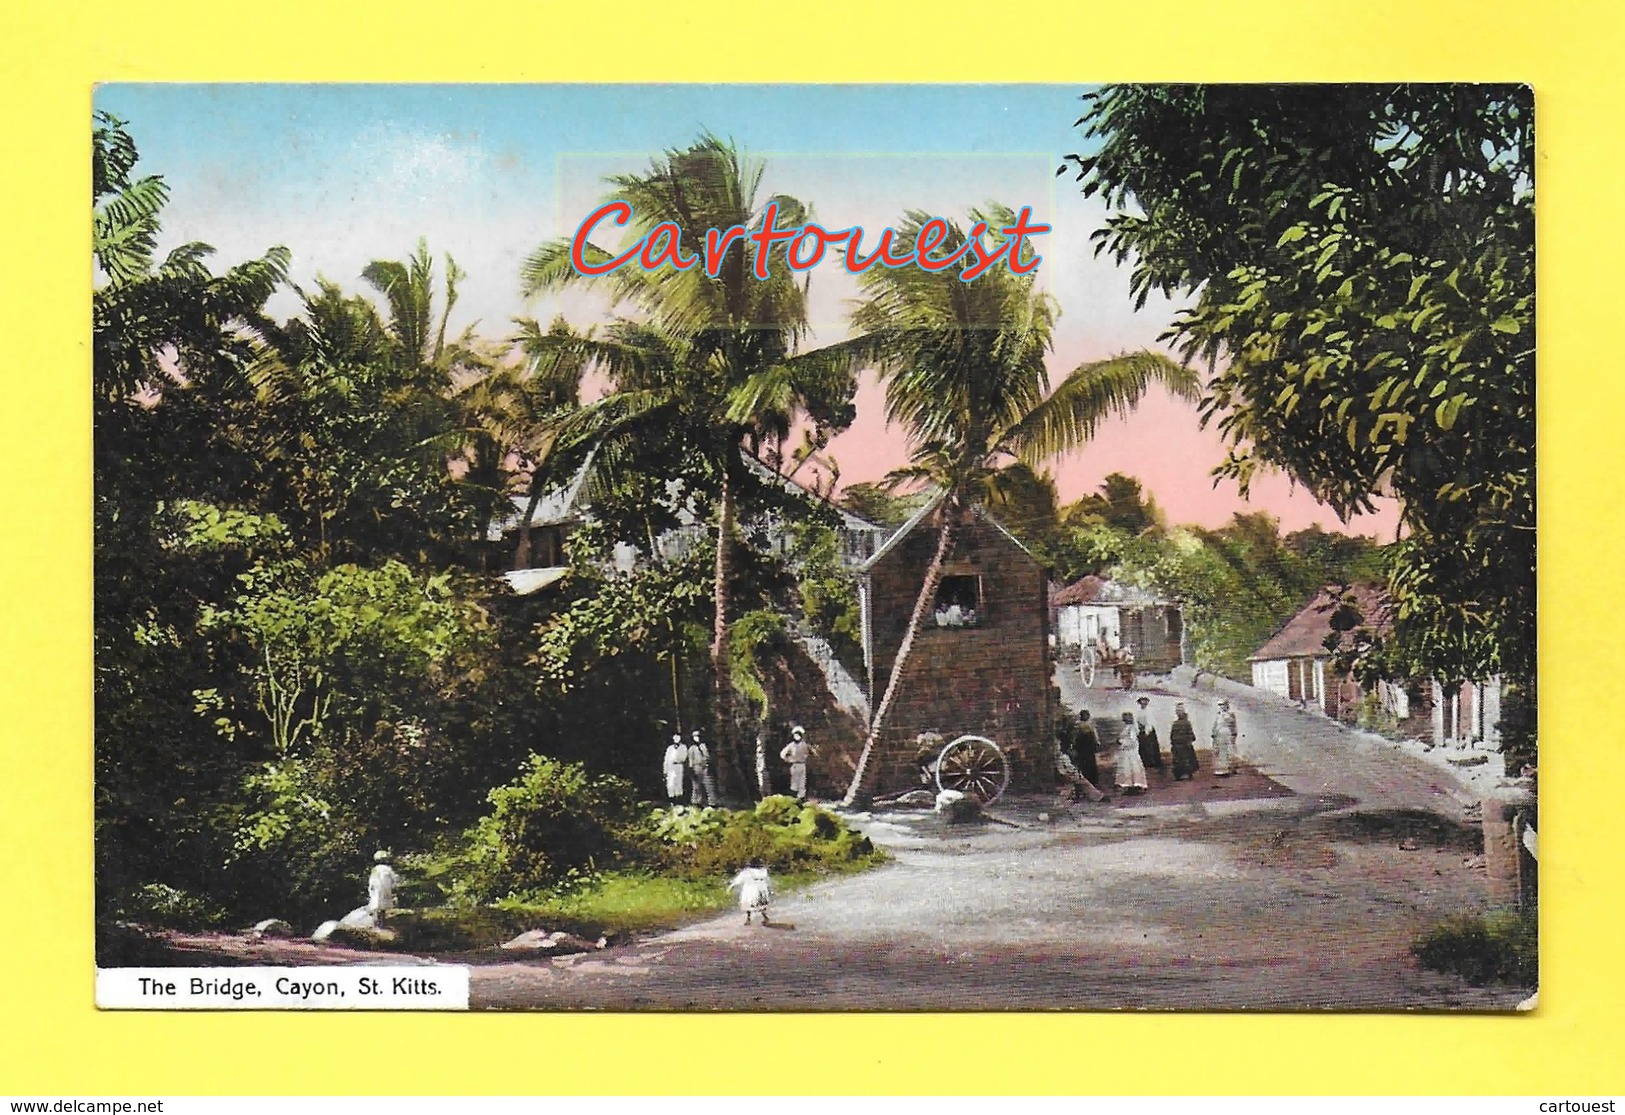 CPA ¤¤ St KITTS Cayon ¤¤ The Bridge ¤¤ 1915 ¤¤ ( Chromo ) - Saint-Christophe-et-Niévès